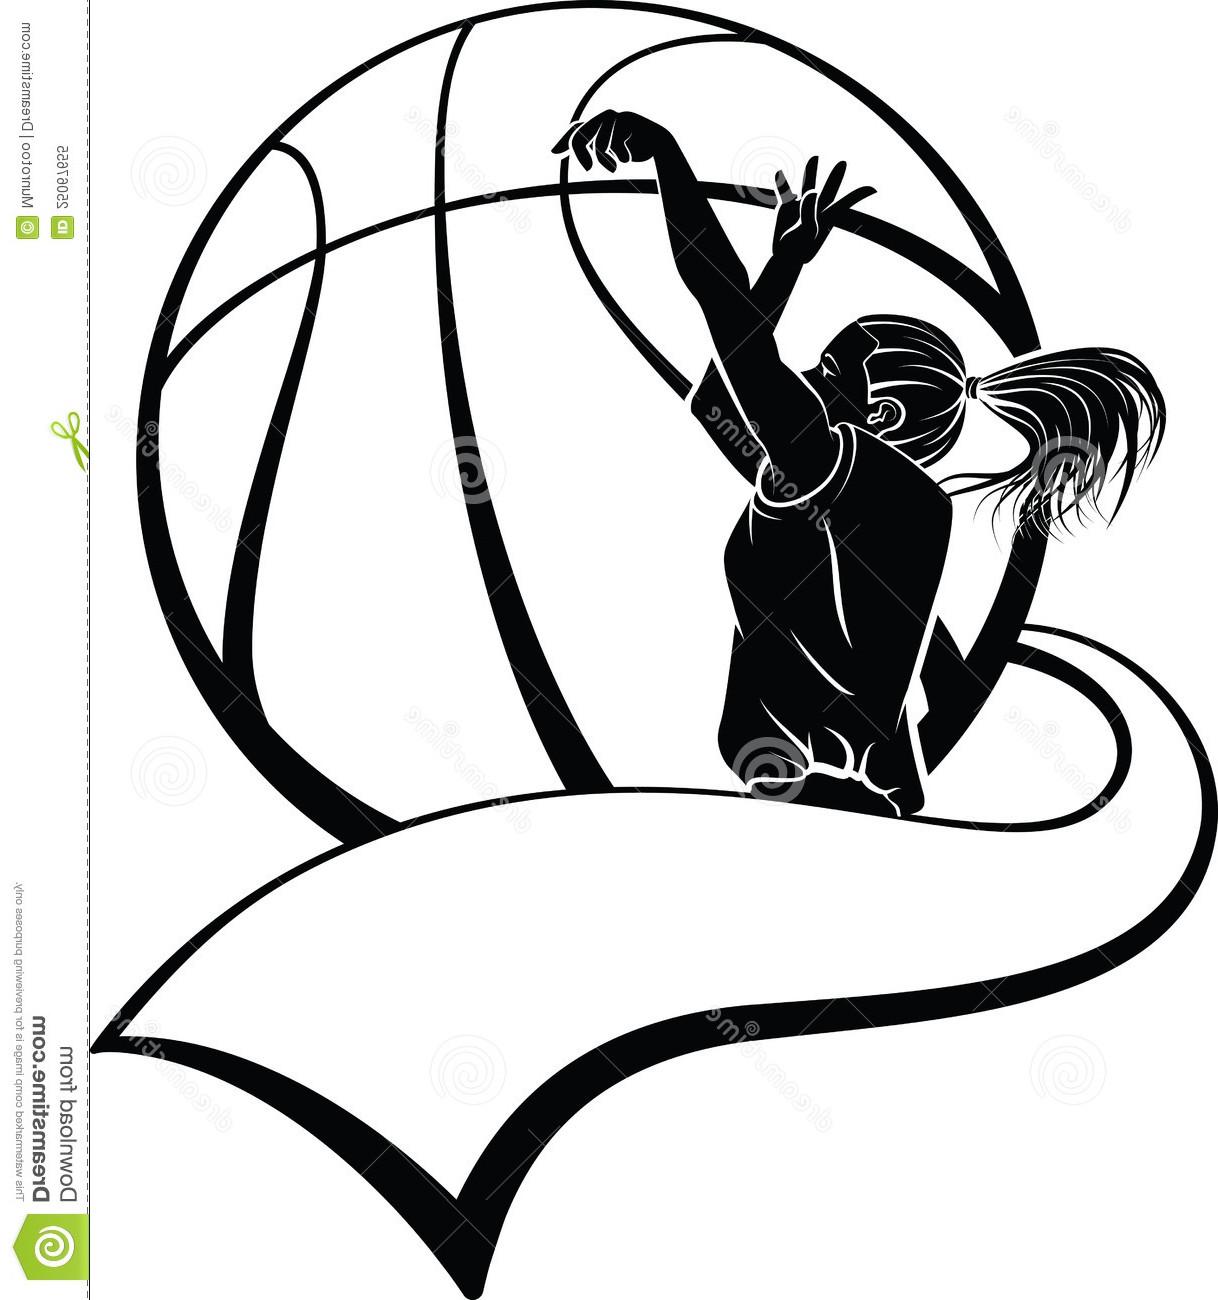 Basketball Player Shooting Clipart Rugve-Basketball Player Shooting Clipart Rugvejhu E1392466958220 Jpg-13